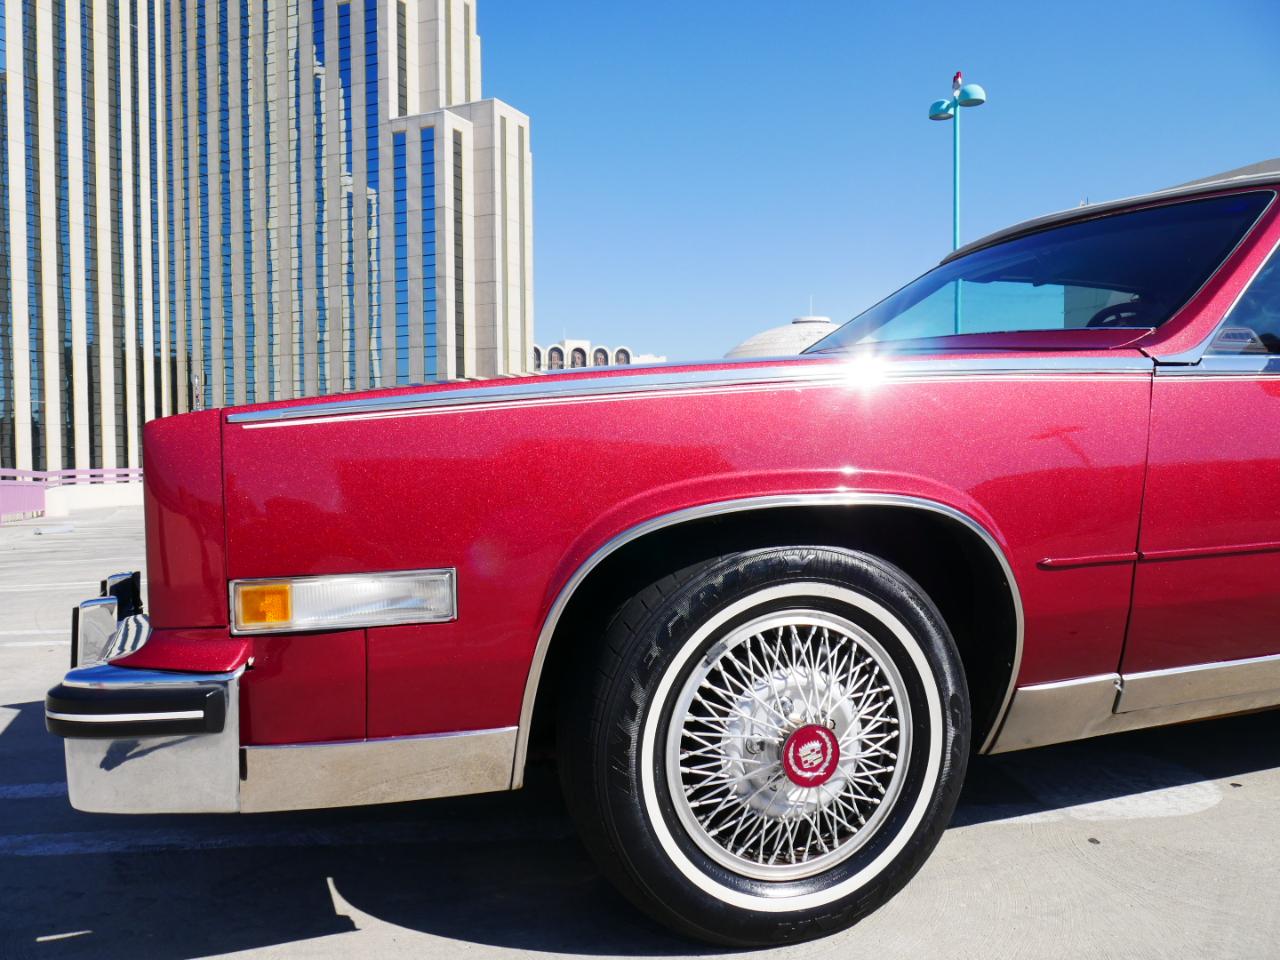 1985 Cadillac Eldorado 2dr Convertible Biarritz